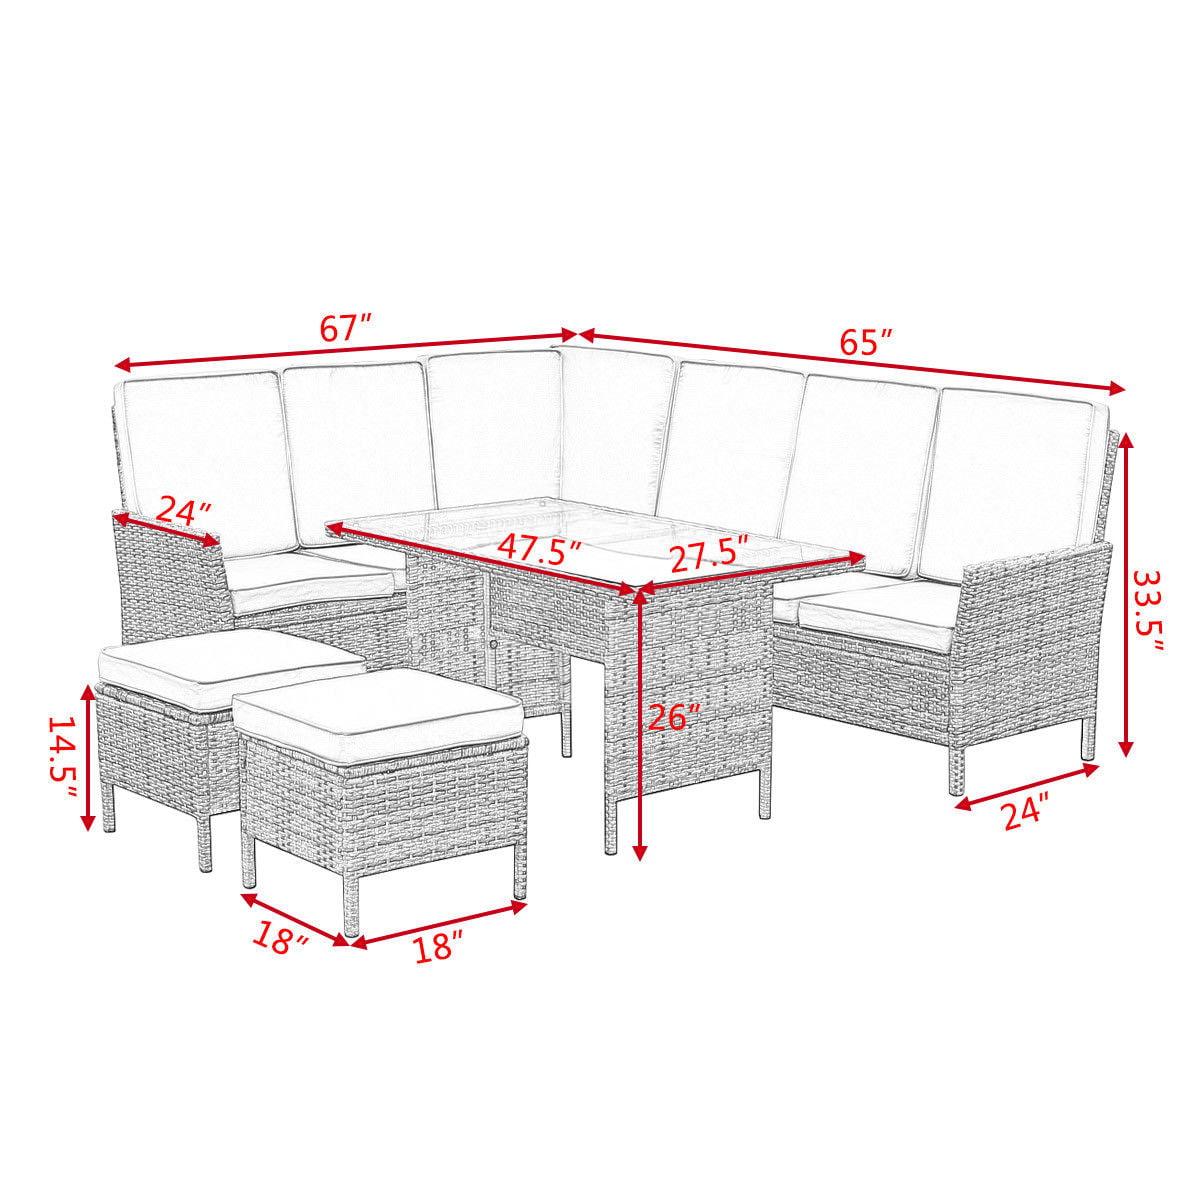 Goplus 5PCS Patio Wicker Rattan Furniture Set Sofa Ottoman Garden Deck W Brown Cushion by Goplus